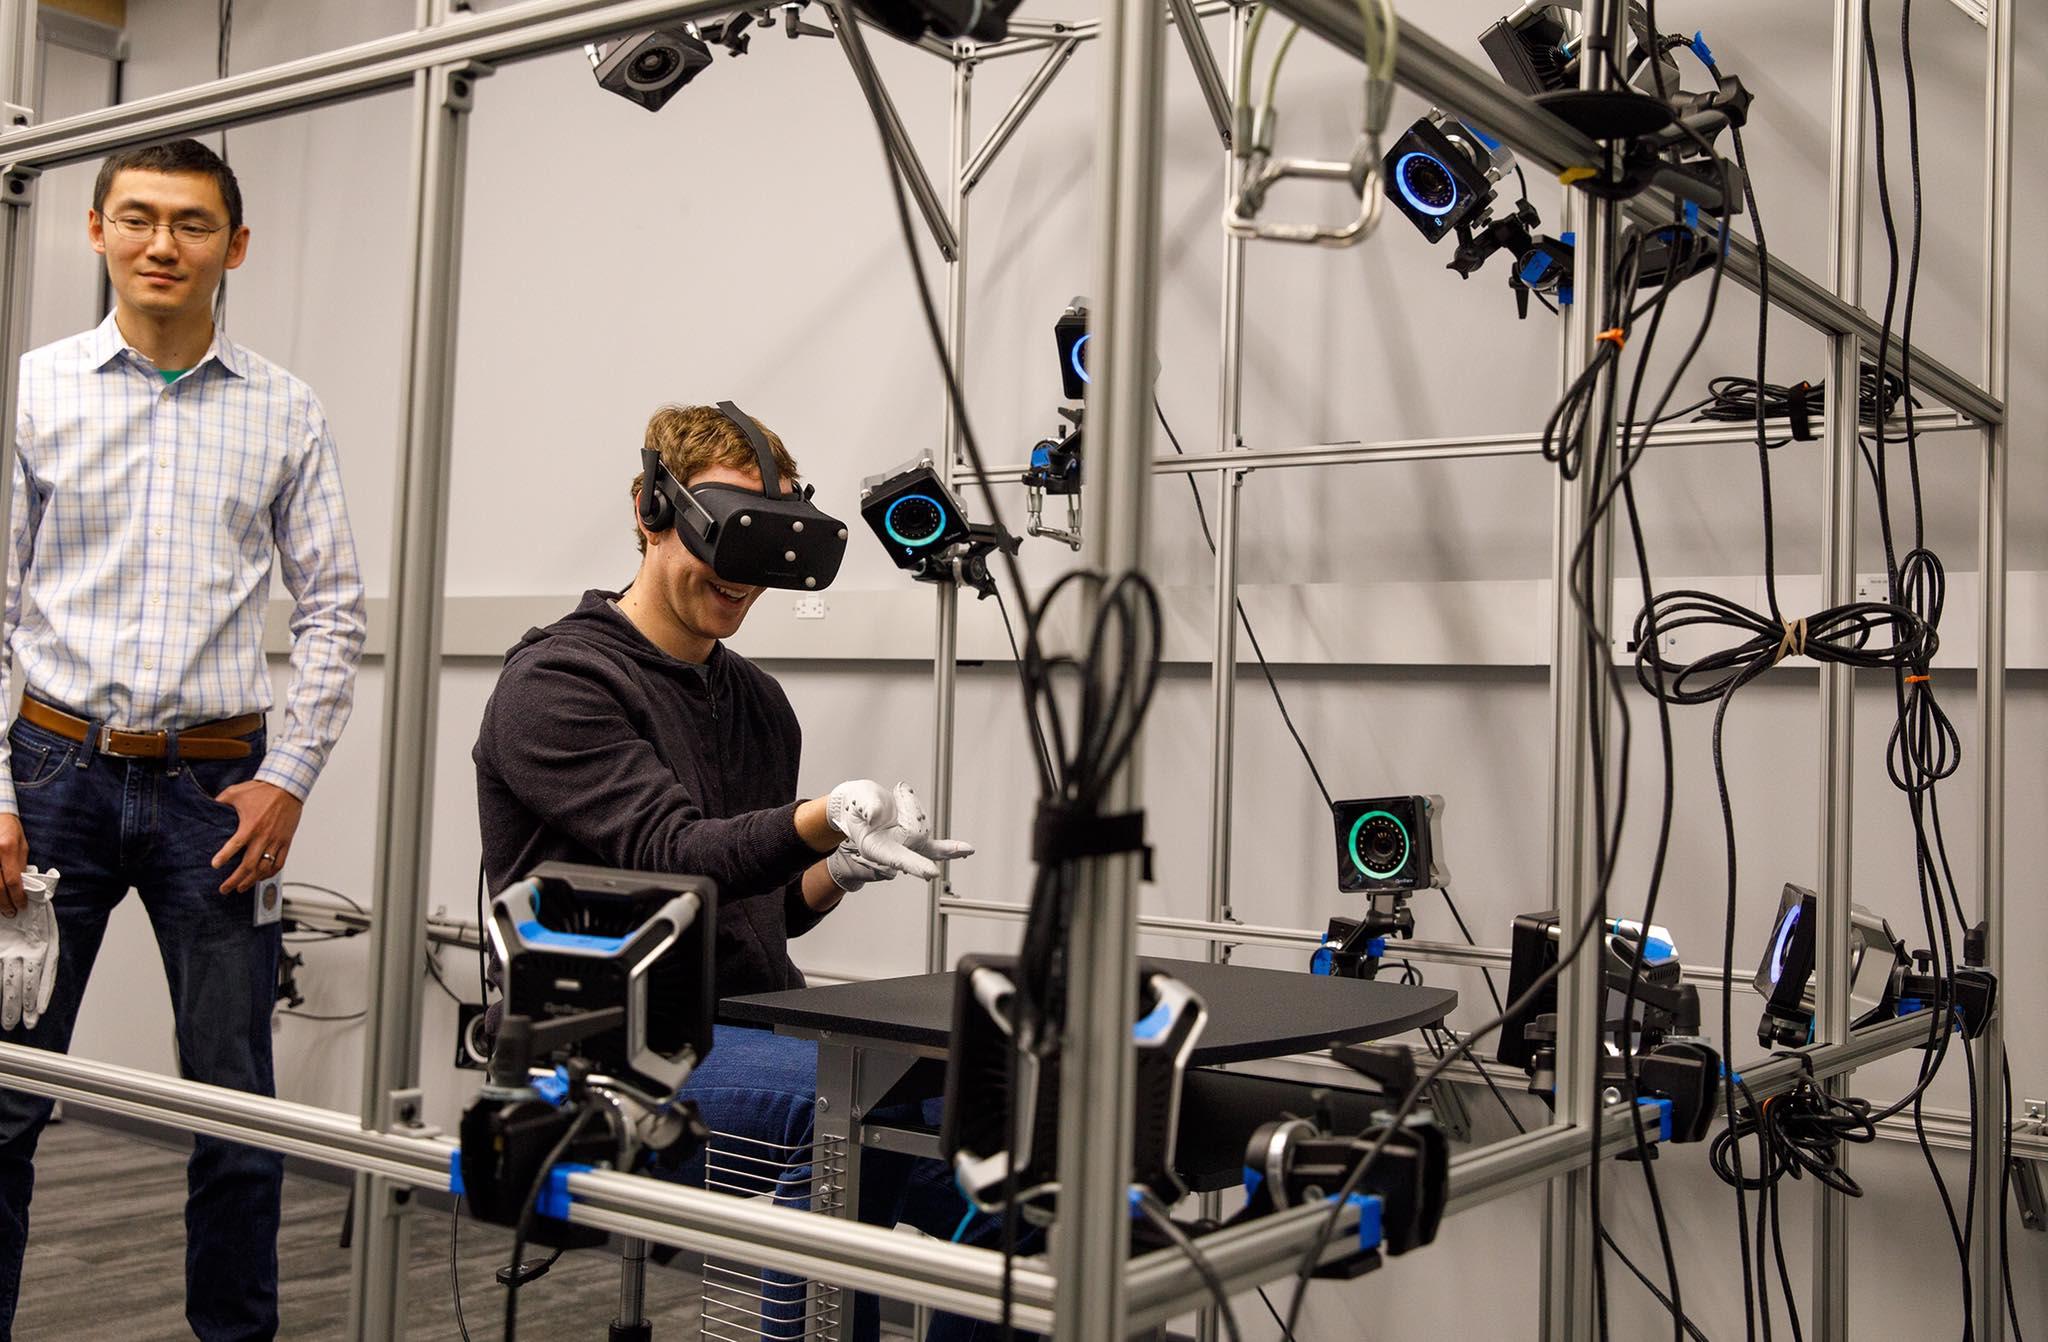 Mark Zuckerberg shows off prototype Oculus VR gloves